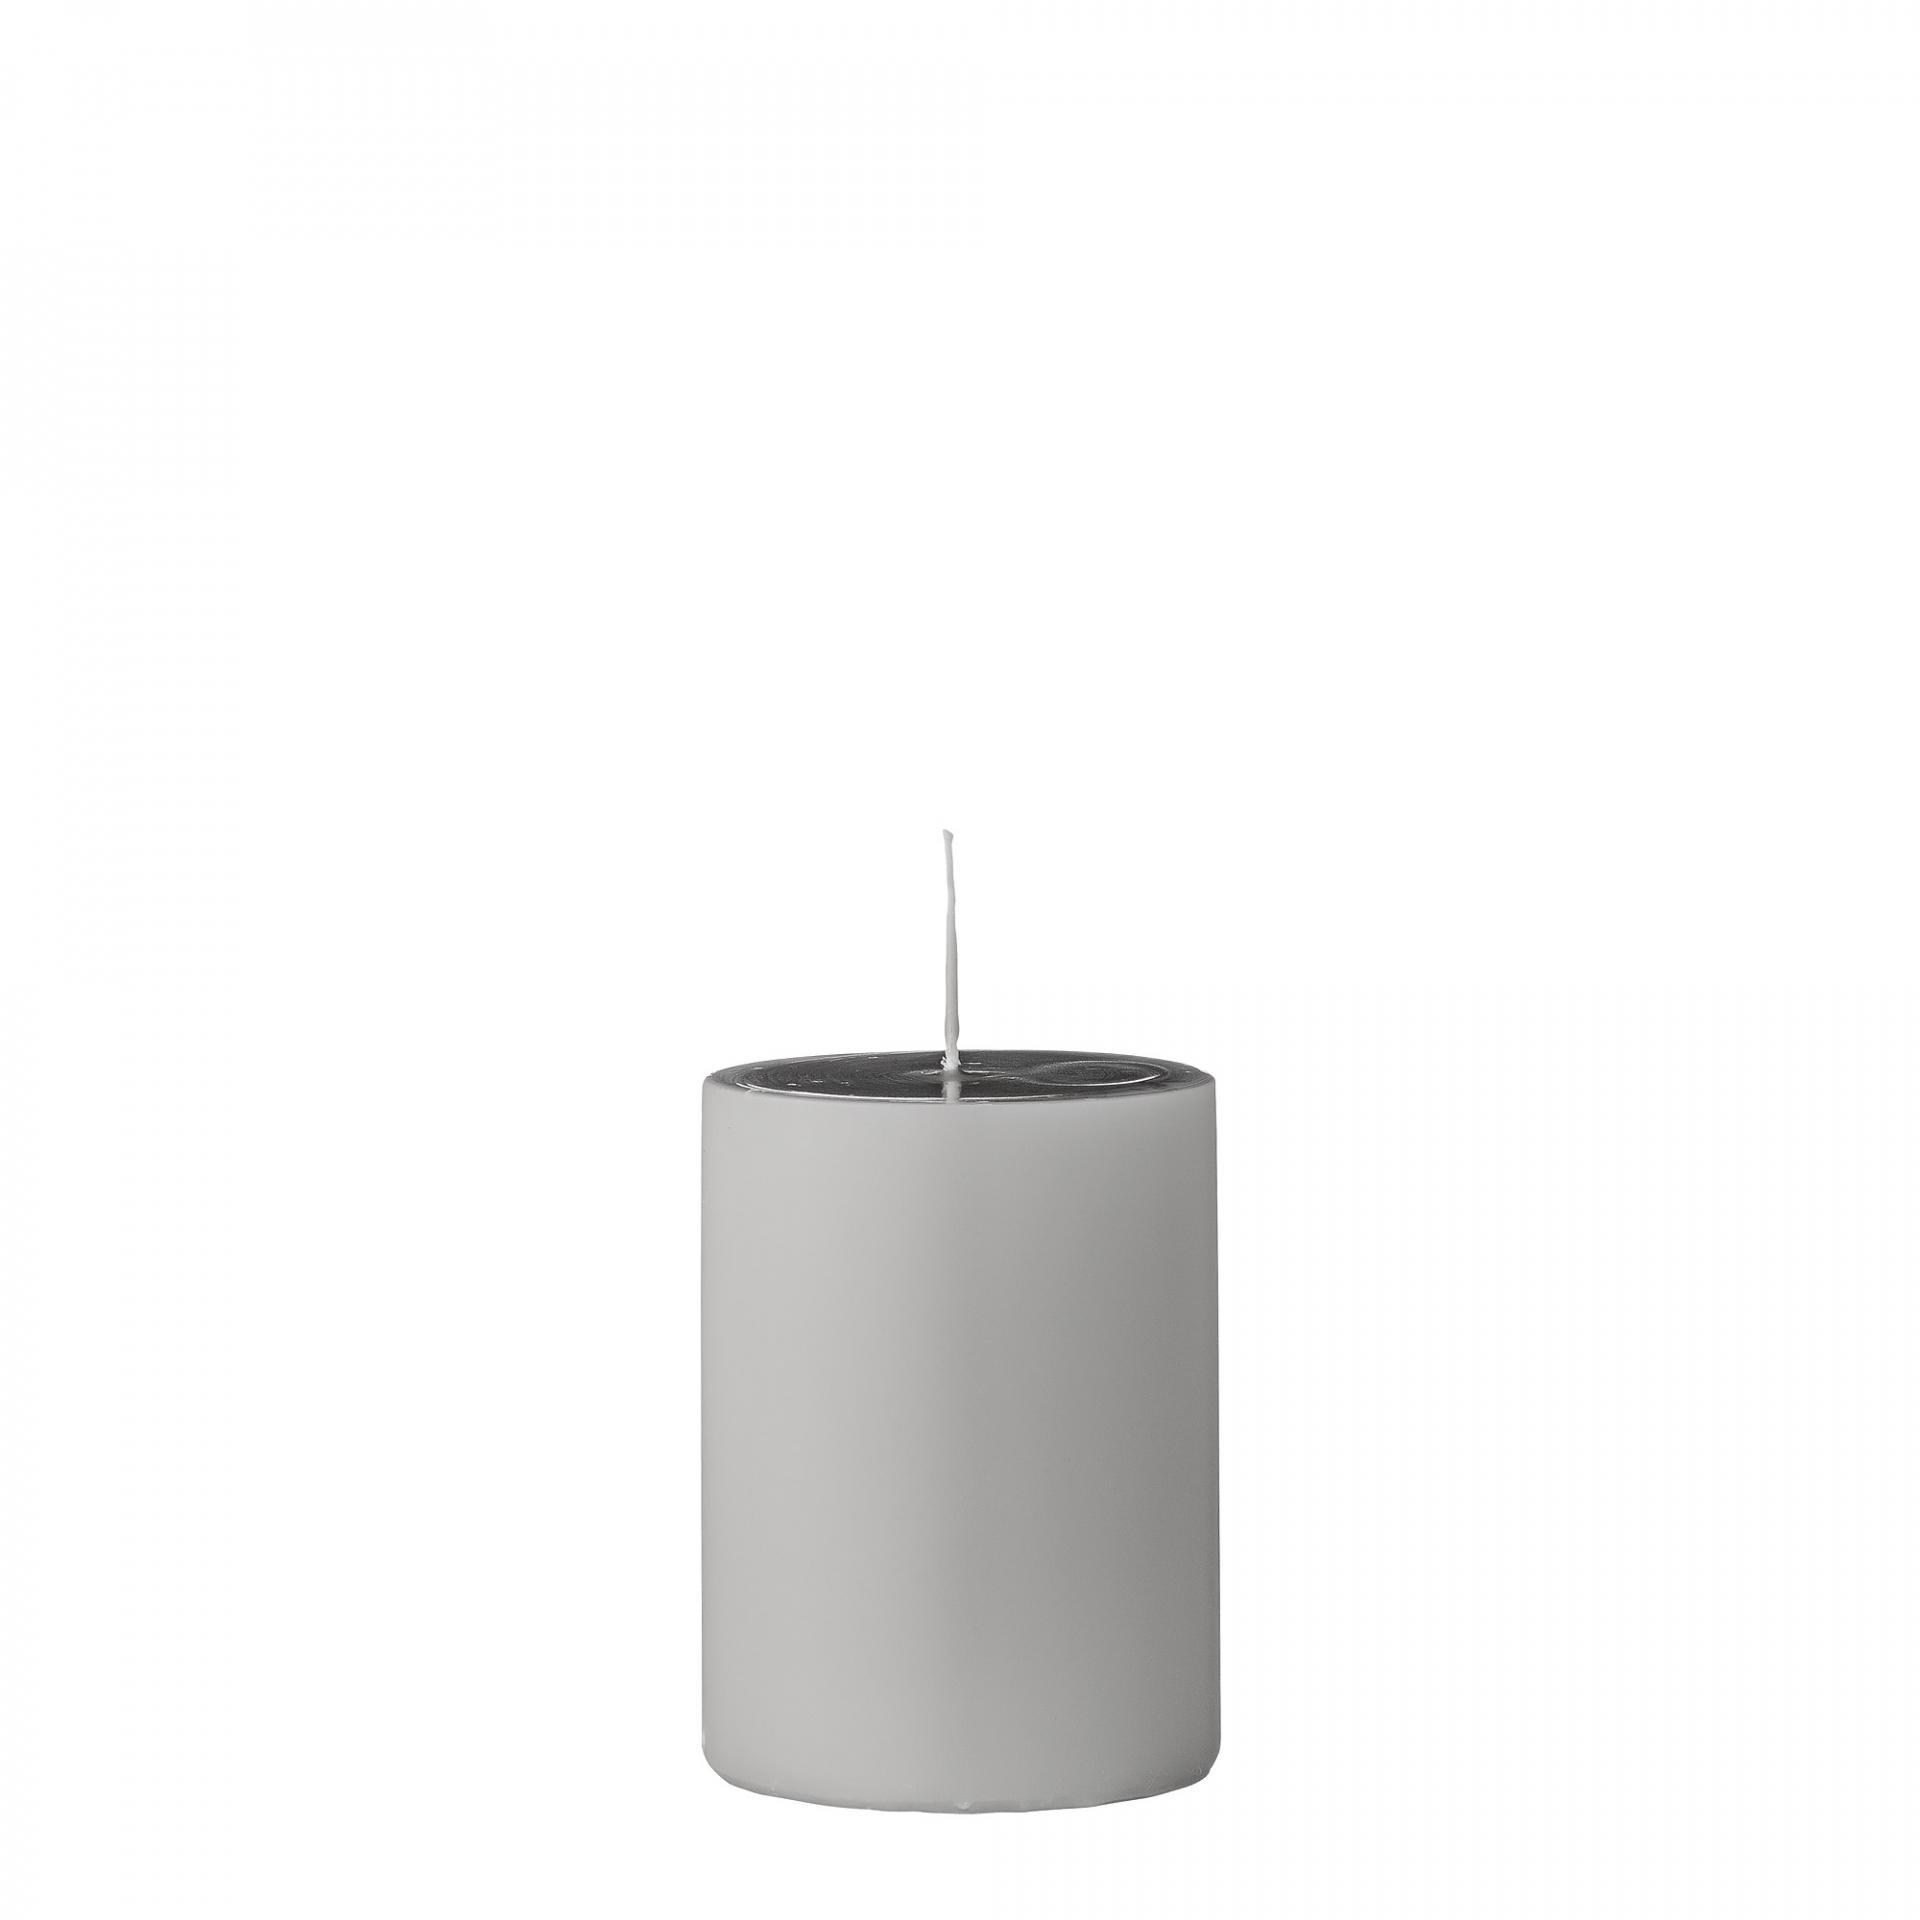 Bloomingville Svíčka Light Grey 10 cm, šedá barva